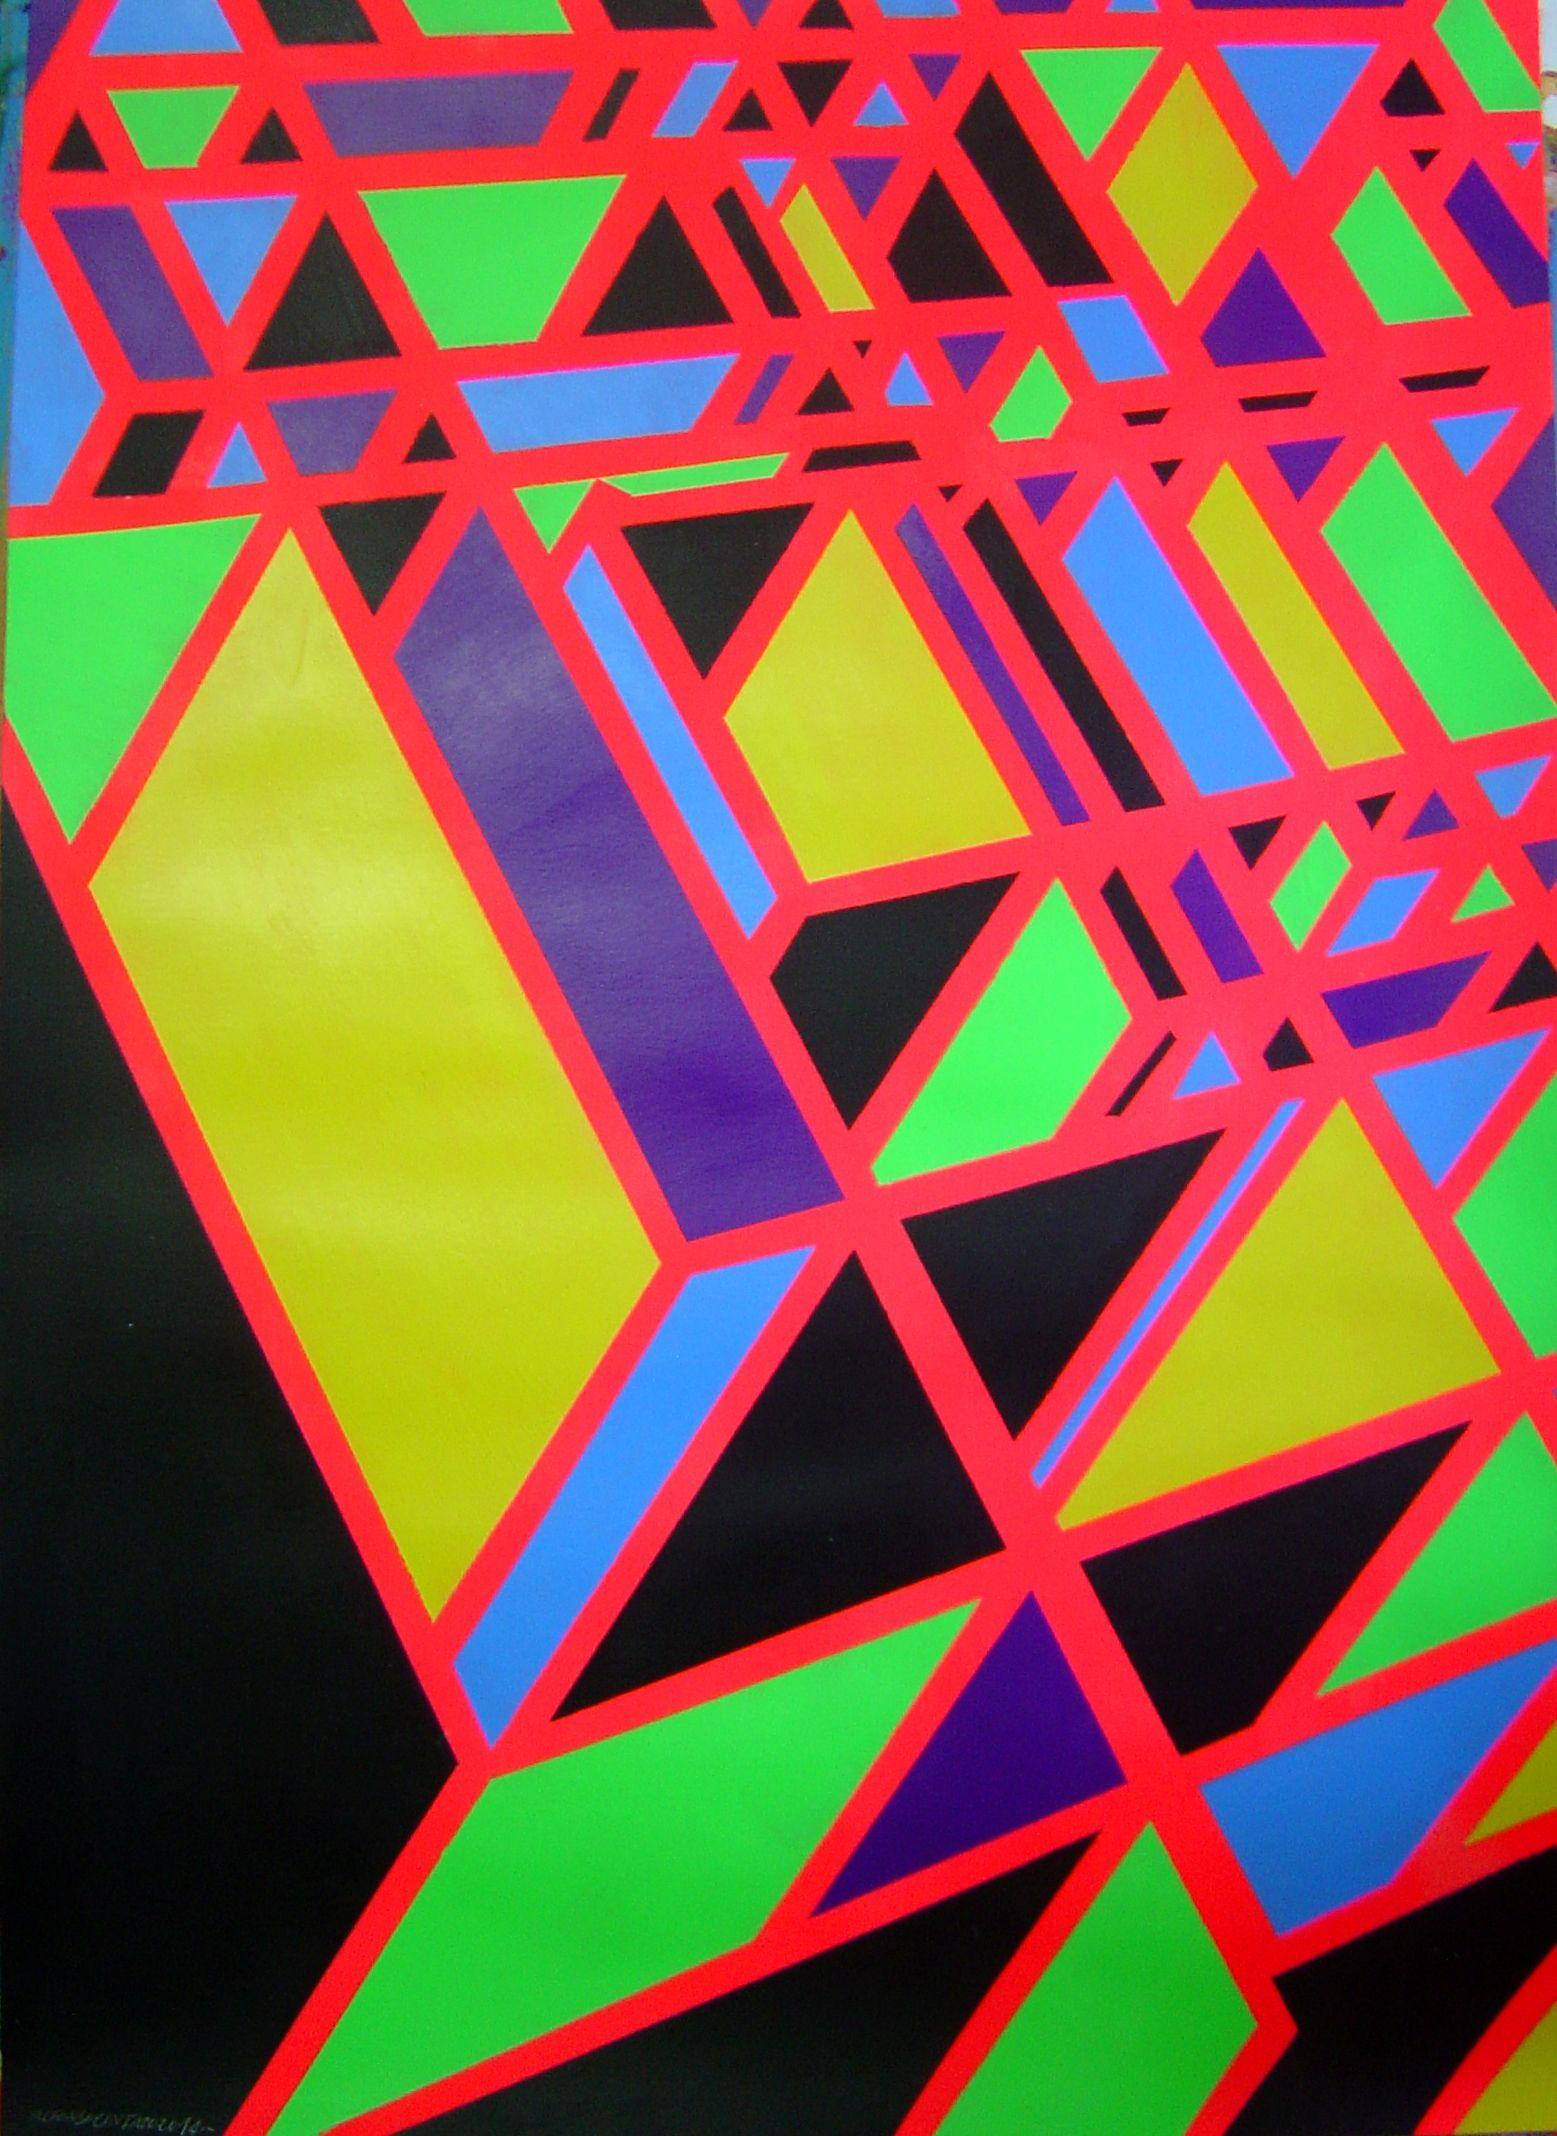 """Die Spinnen I"" Alfonso Cintado Acrylic on paper 70 x 50 cm 2014"